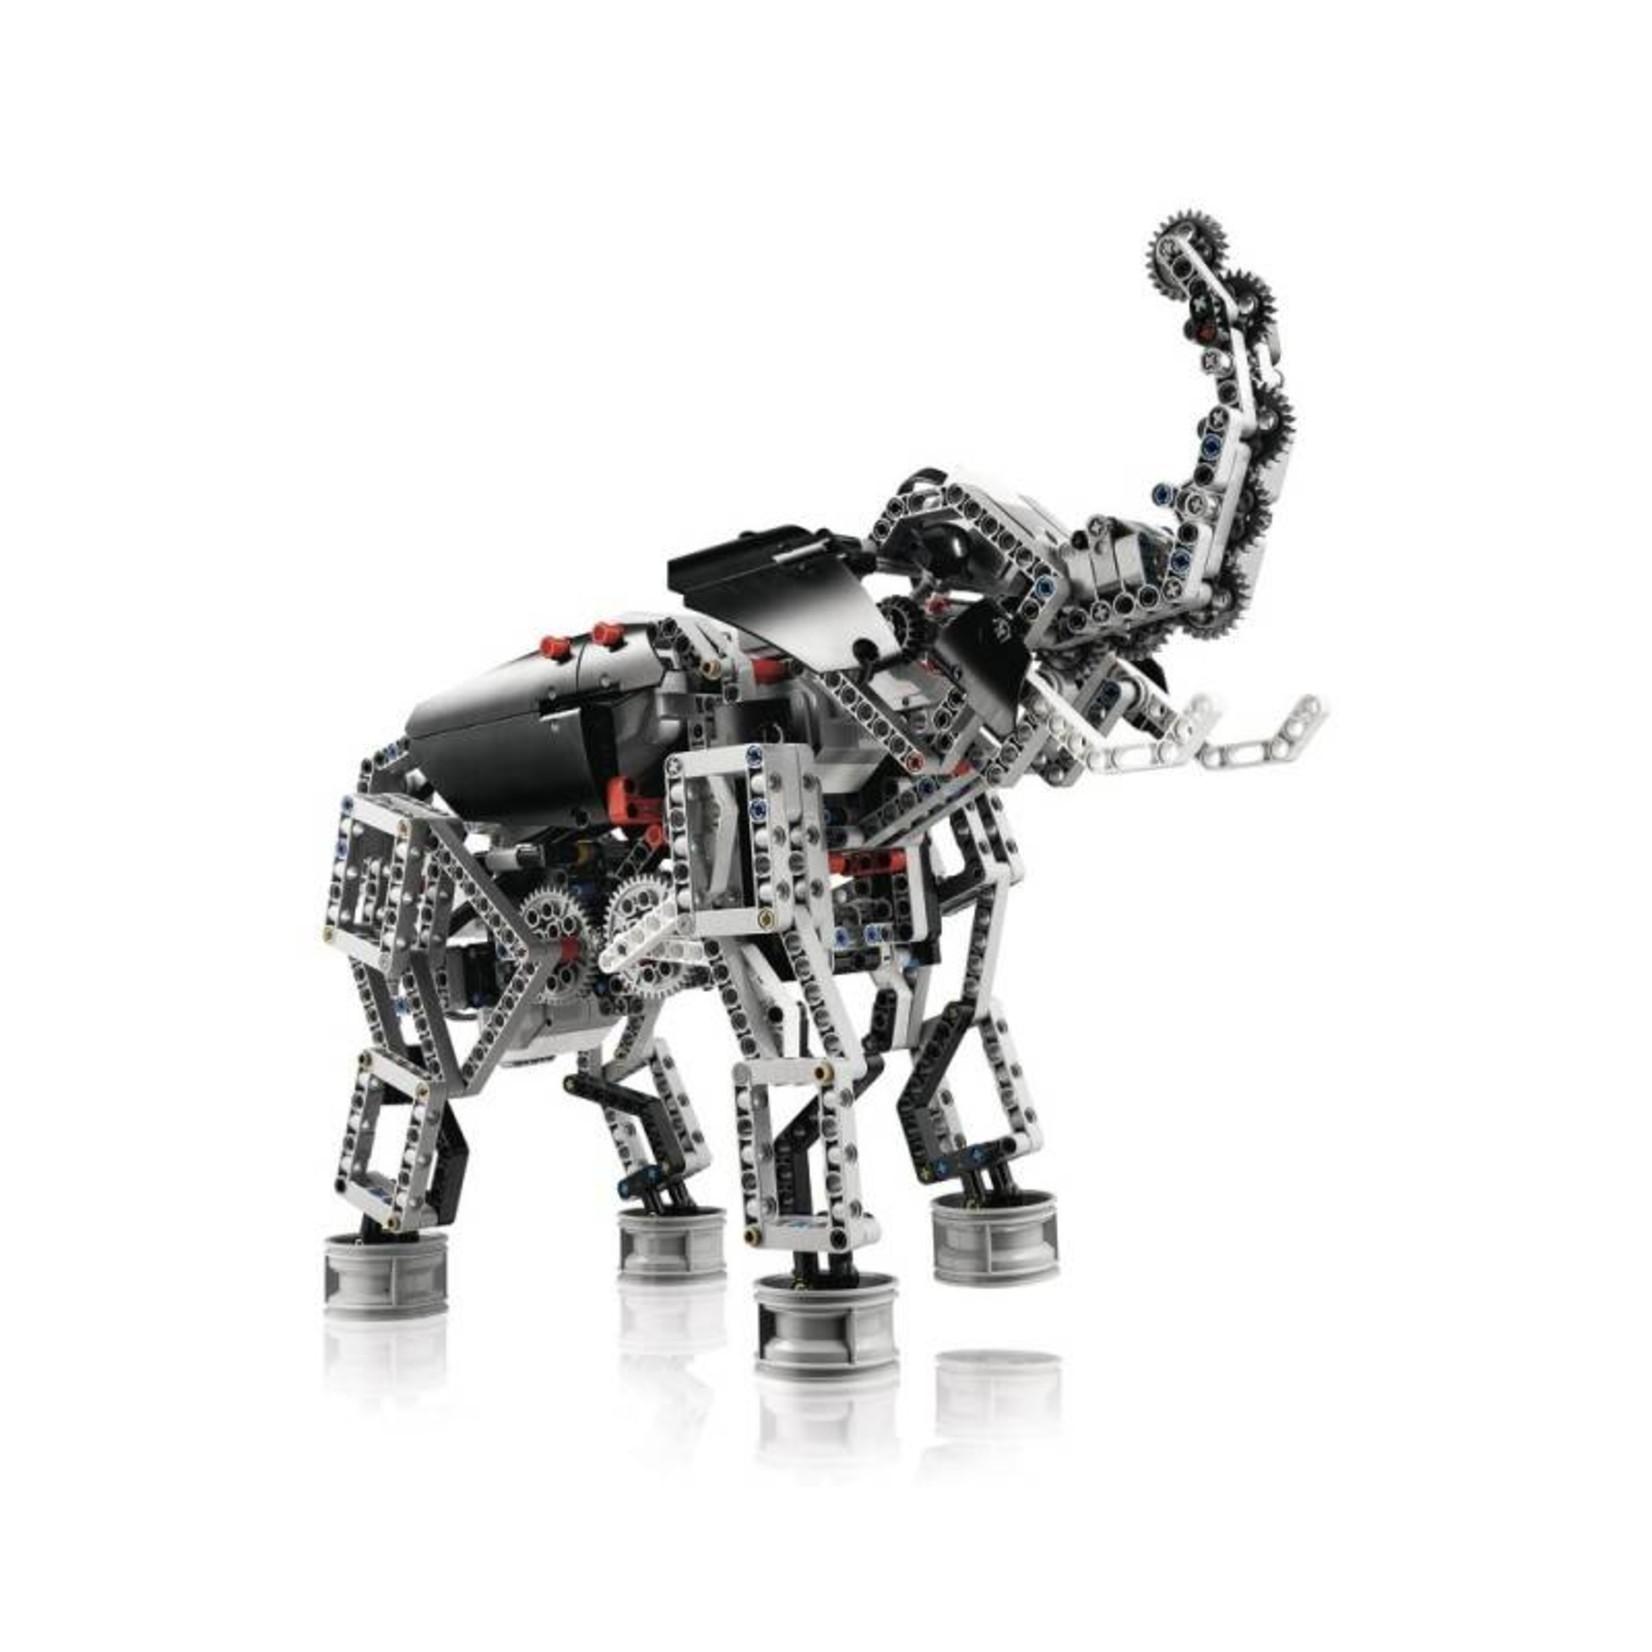 LEGO® Education EV3 Educatieve uitbreidingsset